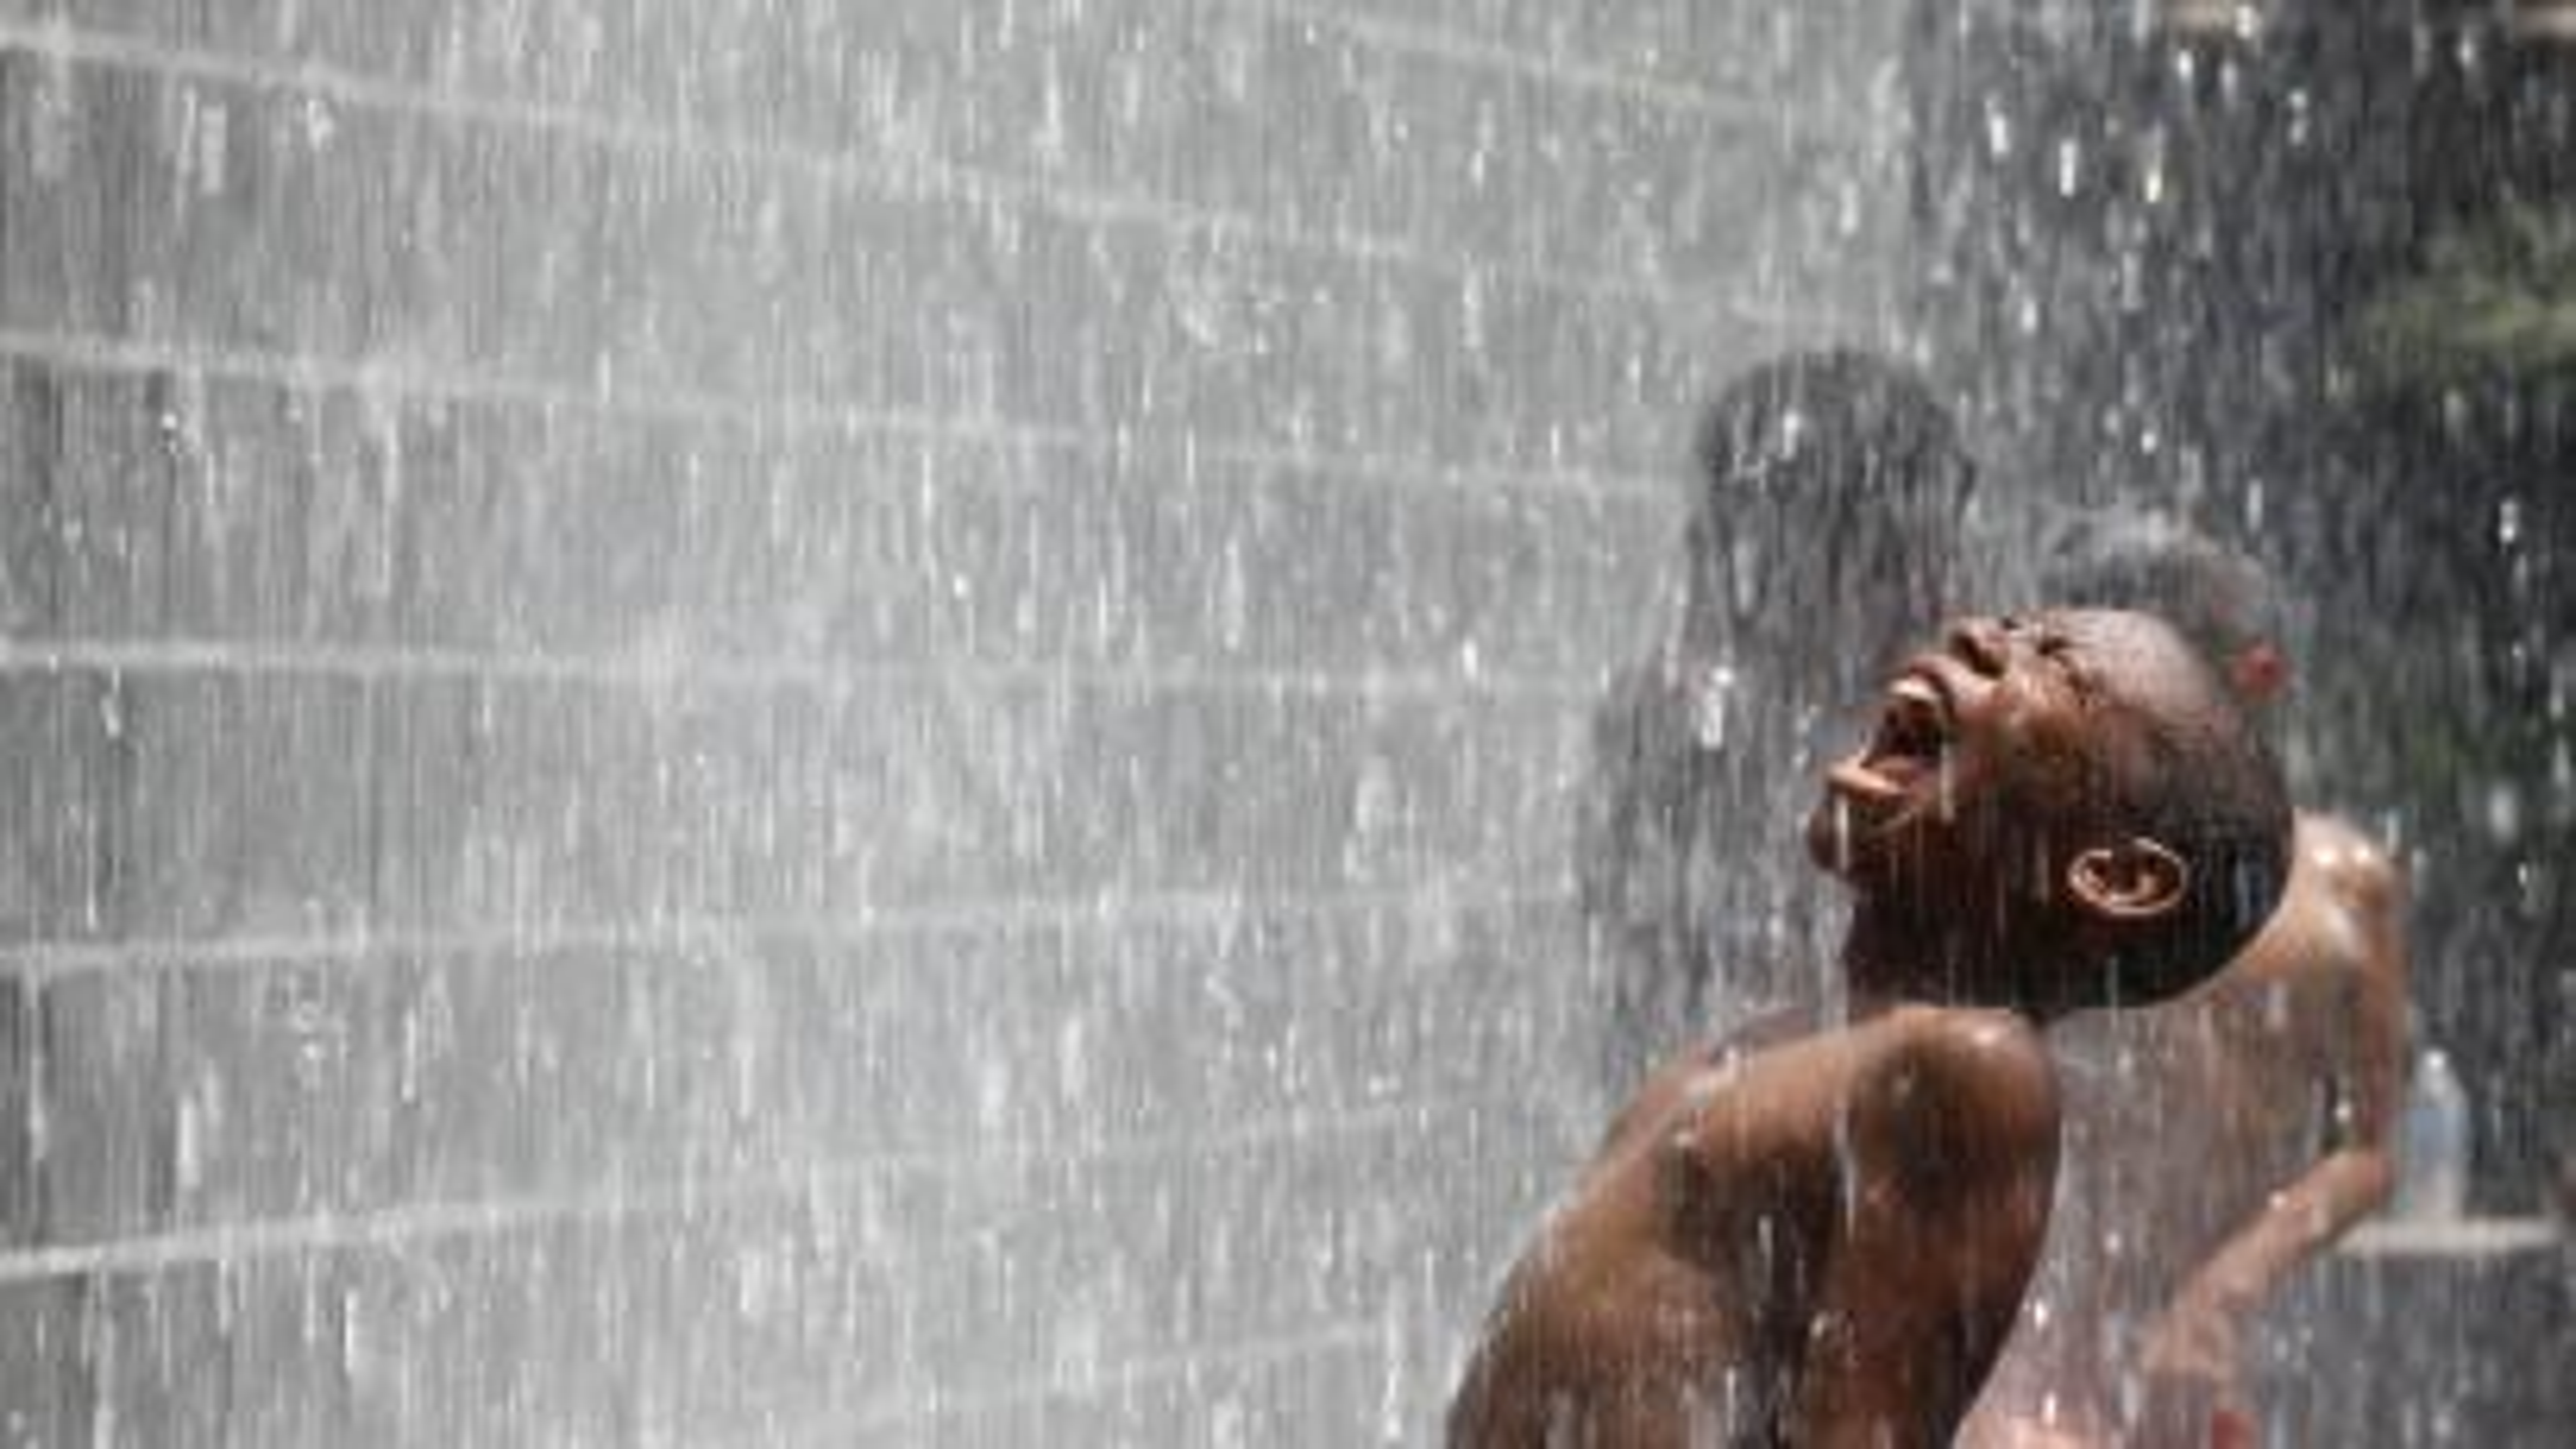 Screaming water fountain boy cool down swim